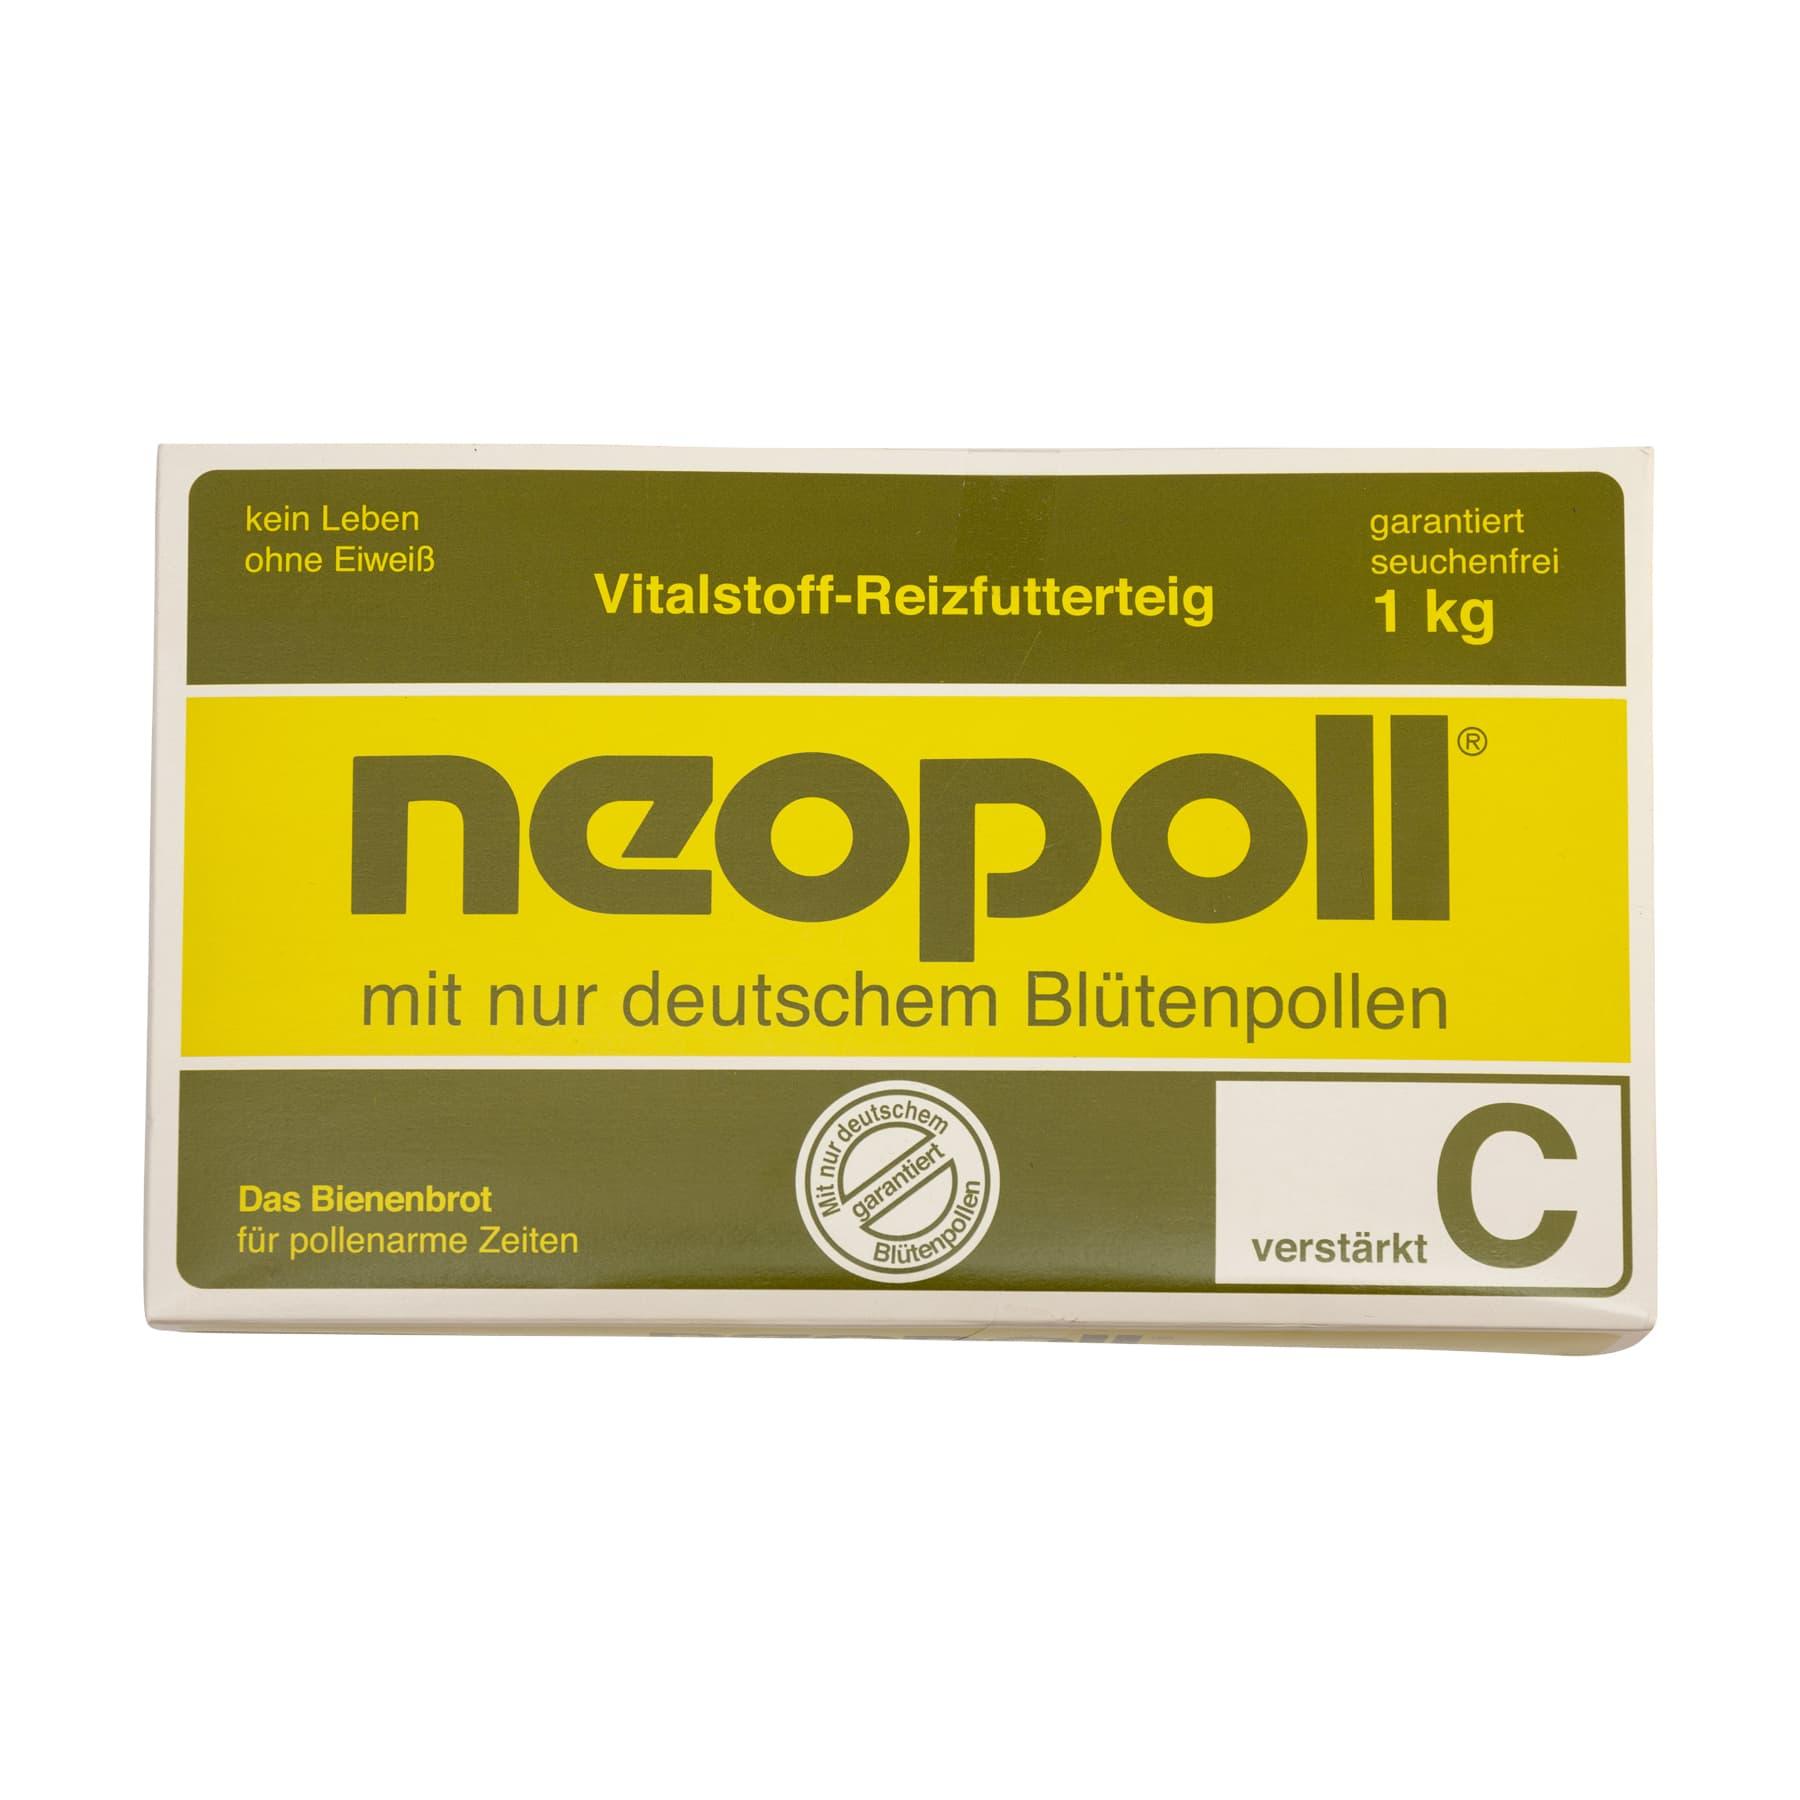 Neopoll C verstärkt 1 kg